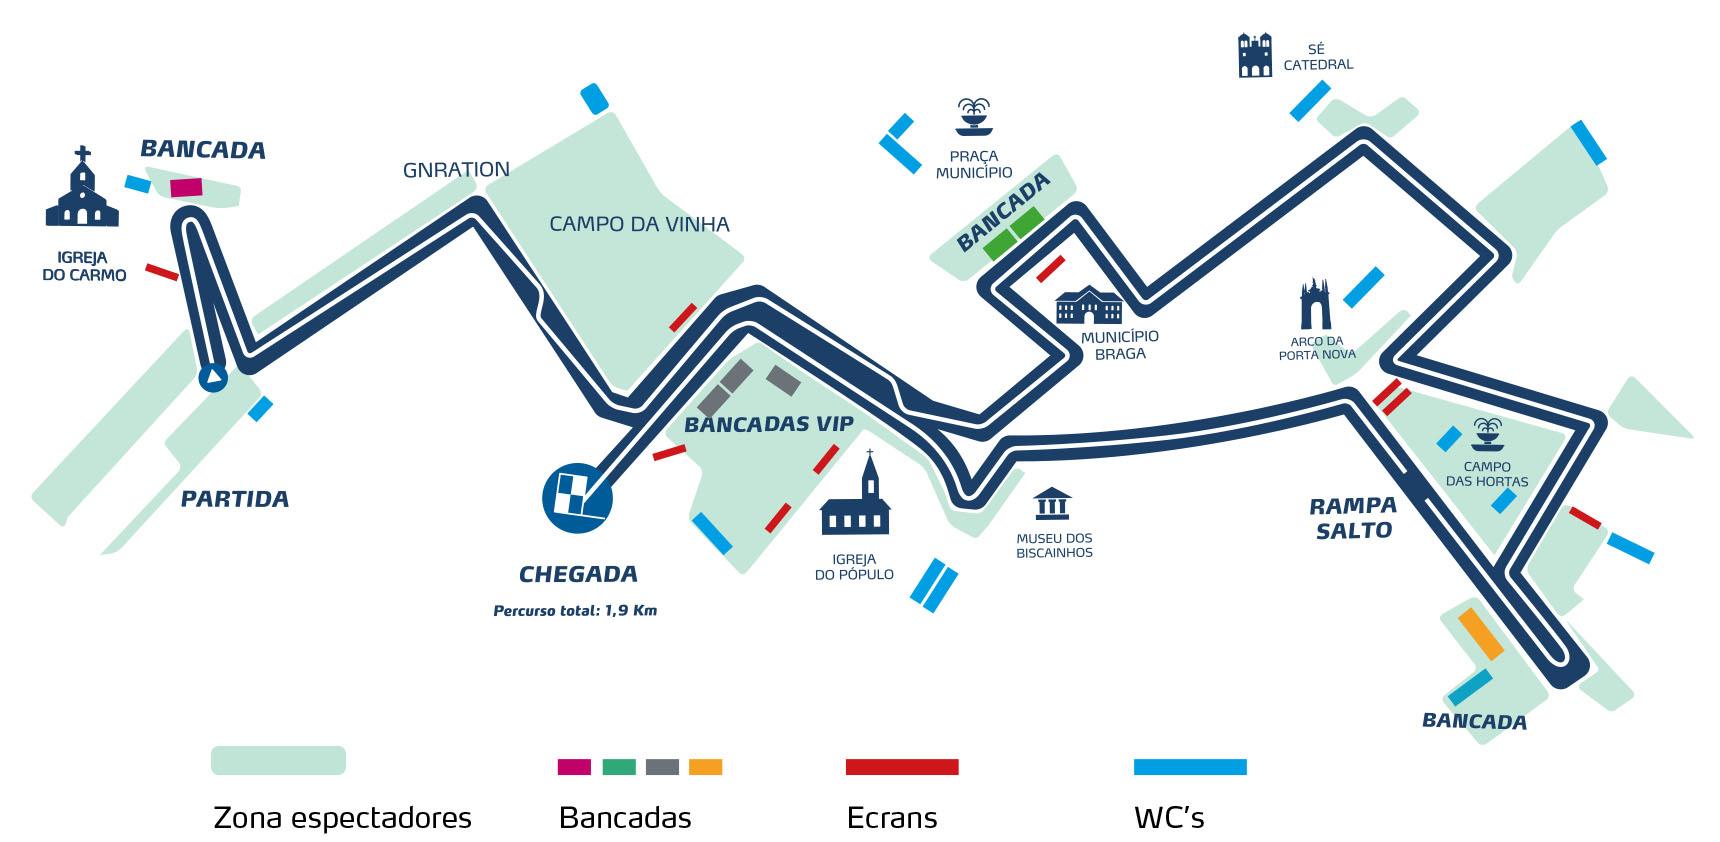 mapa-espectadores-braga-street-stage-campeonato-mundo-rally-wrc-braga